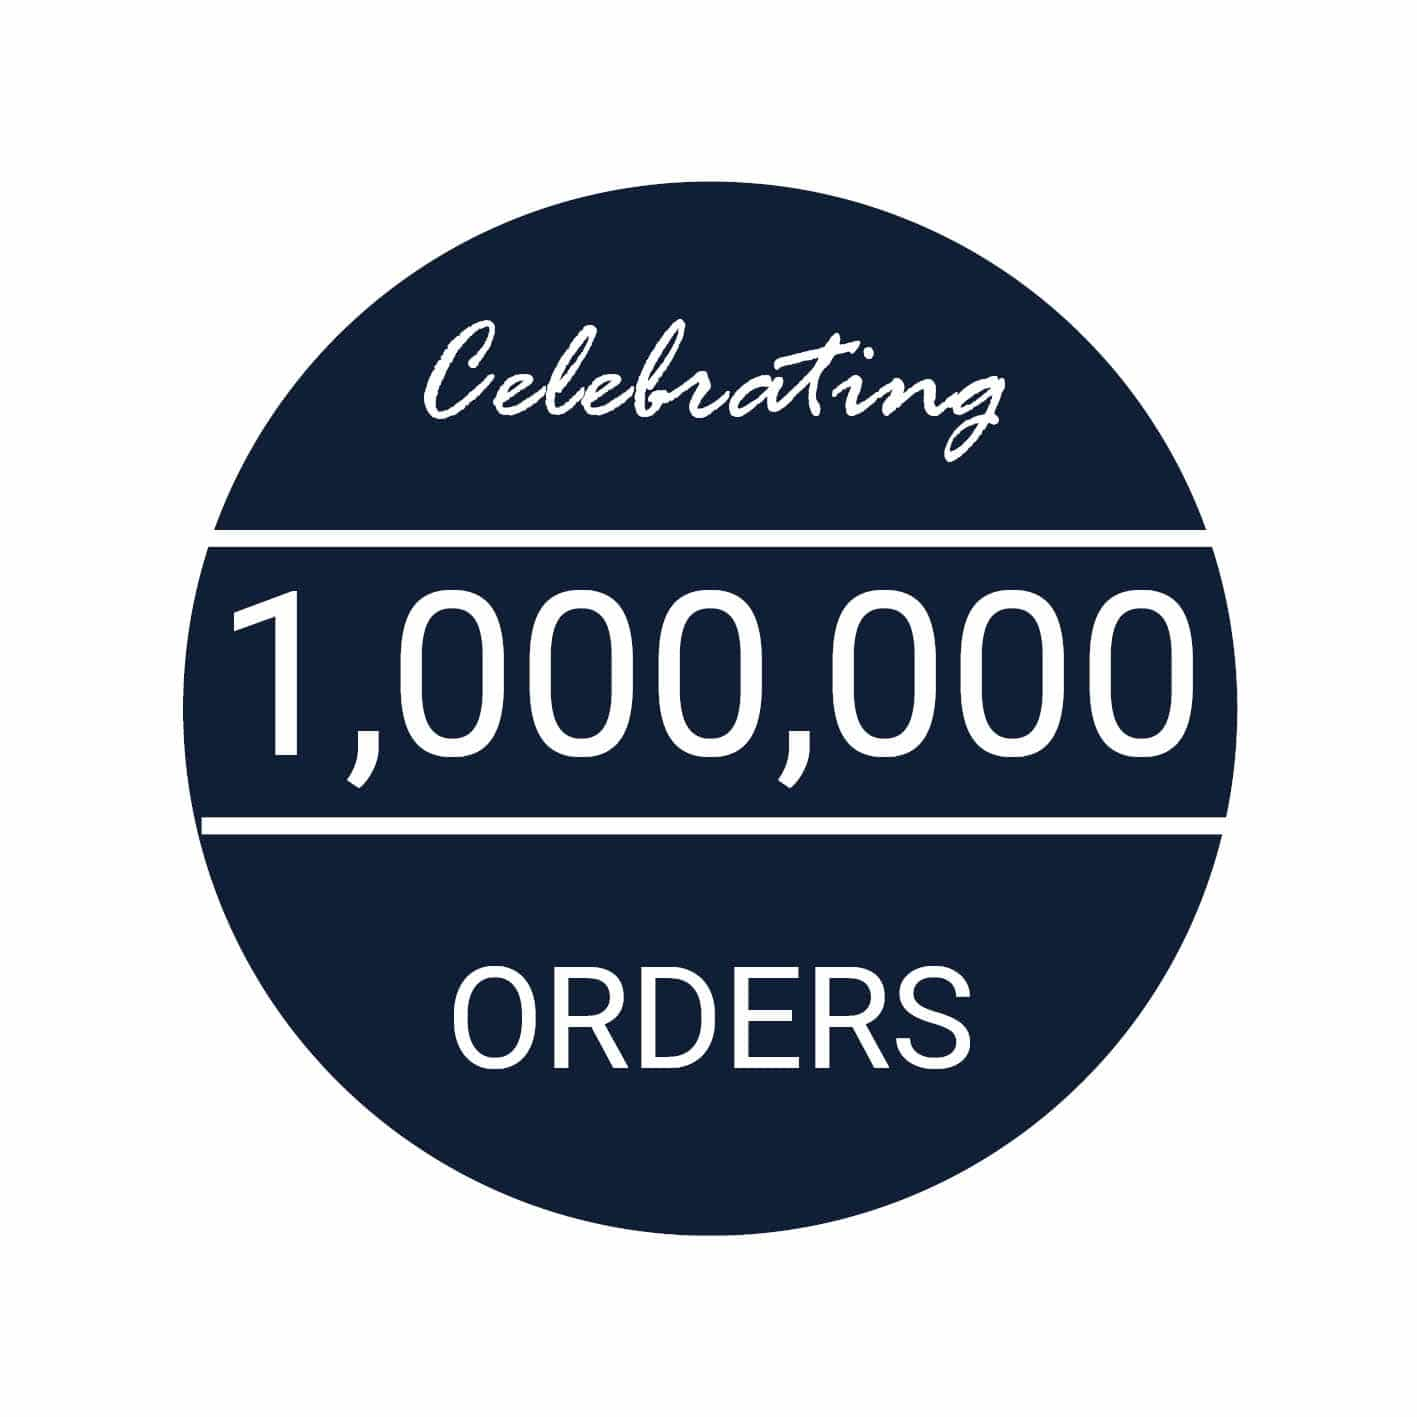 1,000,000 order badge